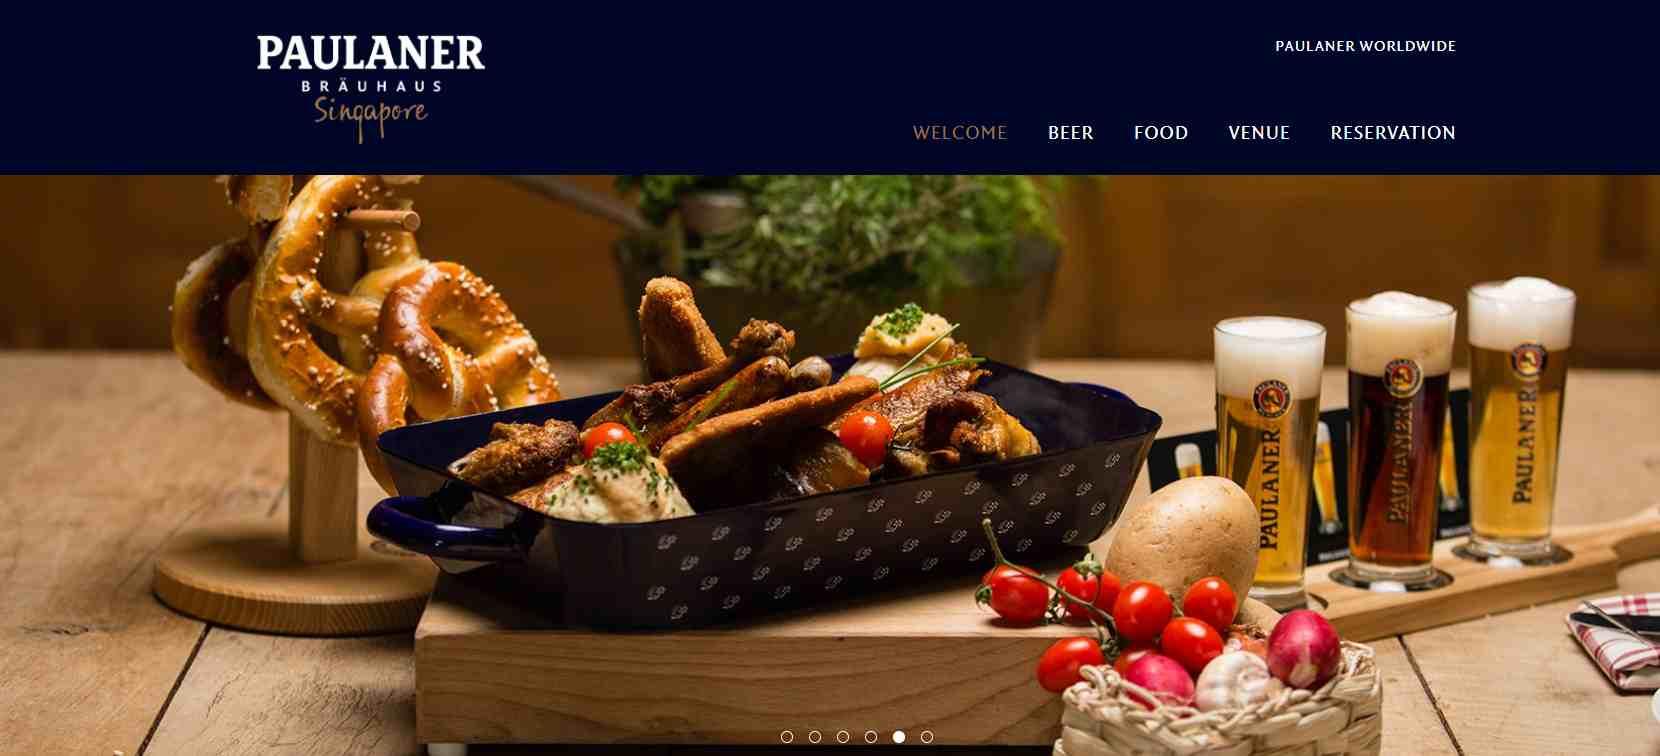 paulaner Top German Restaurants in Singapore